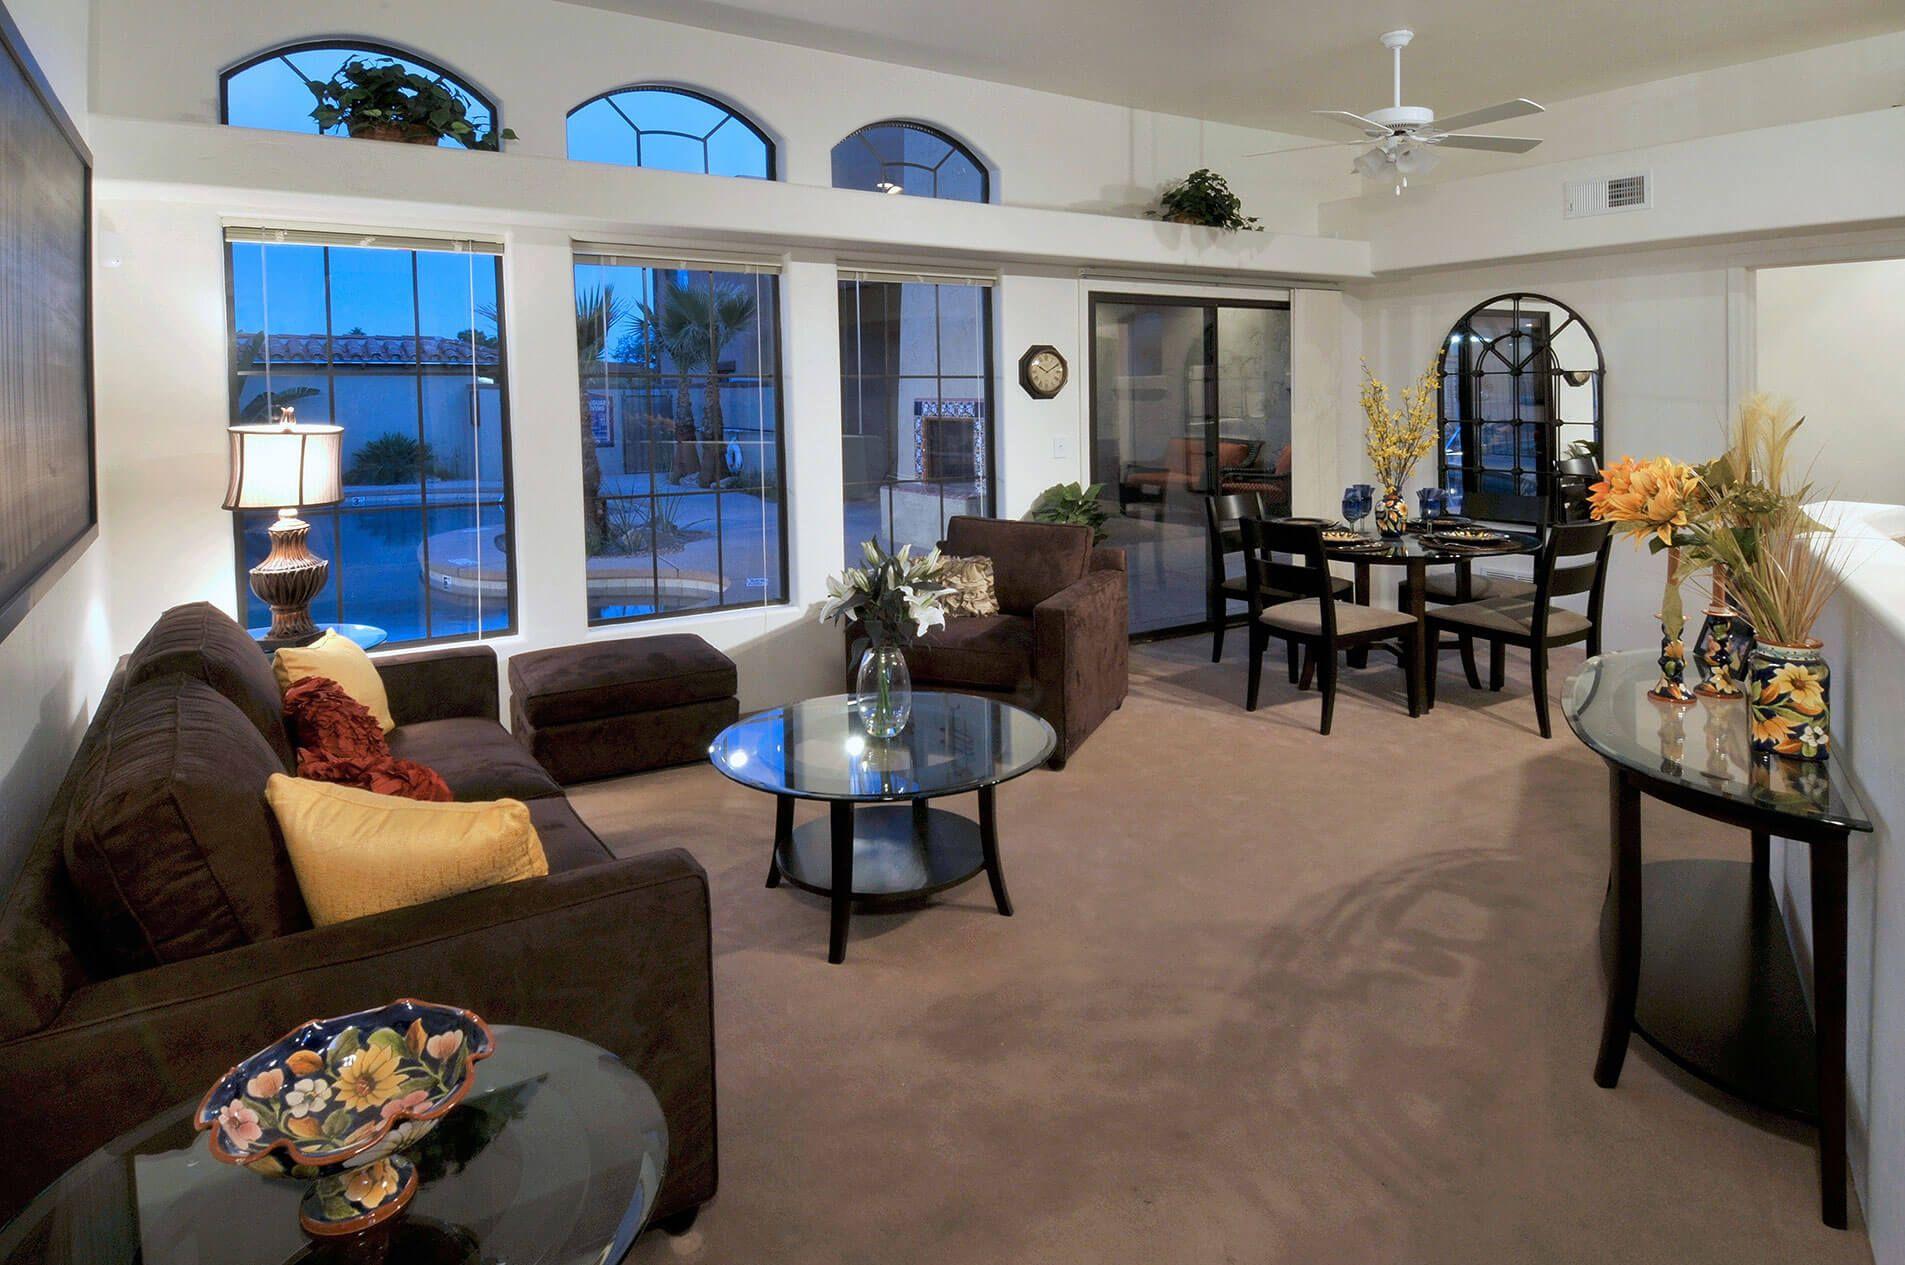 Apartments for Rent in Tucson AZ | Tucson Apartments ...